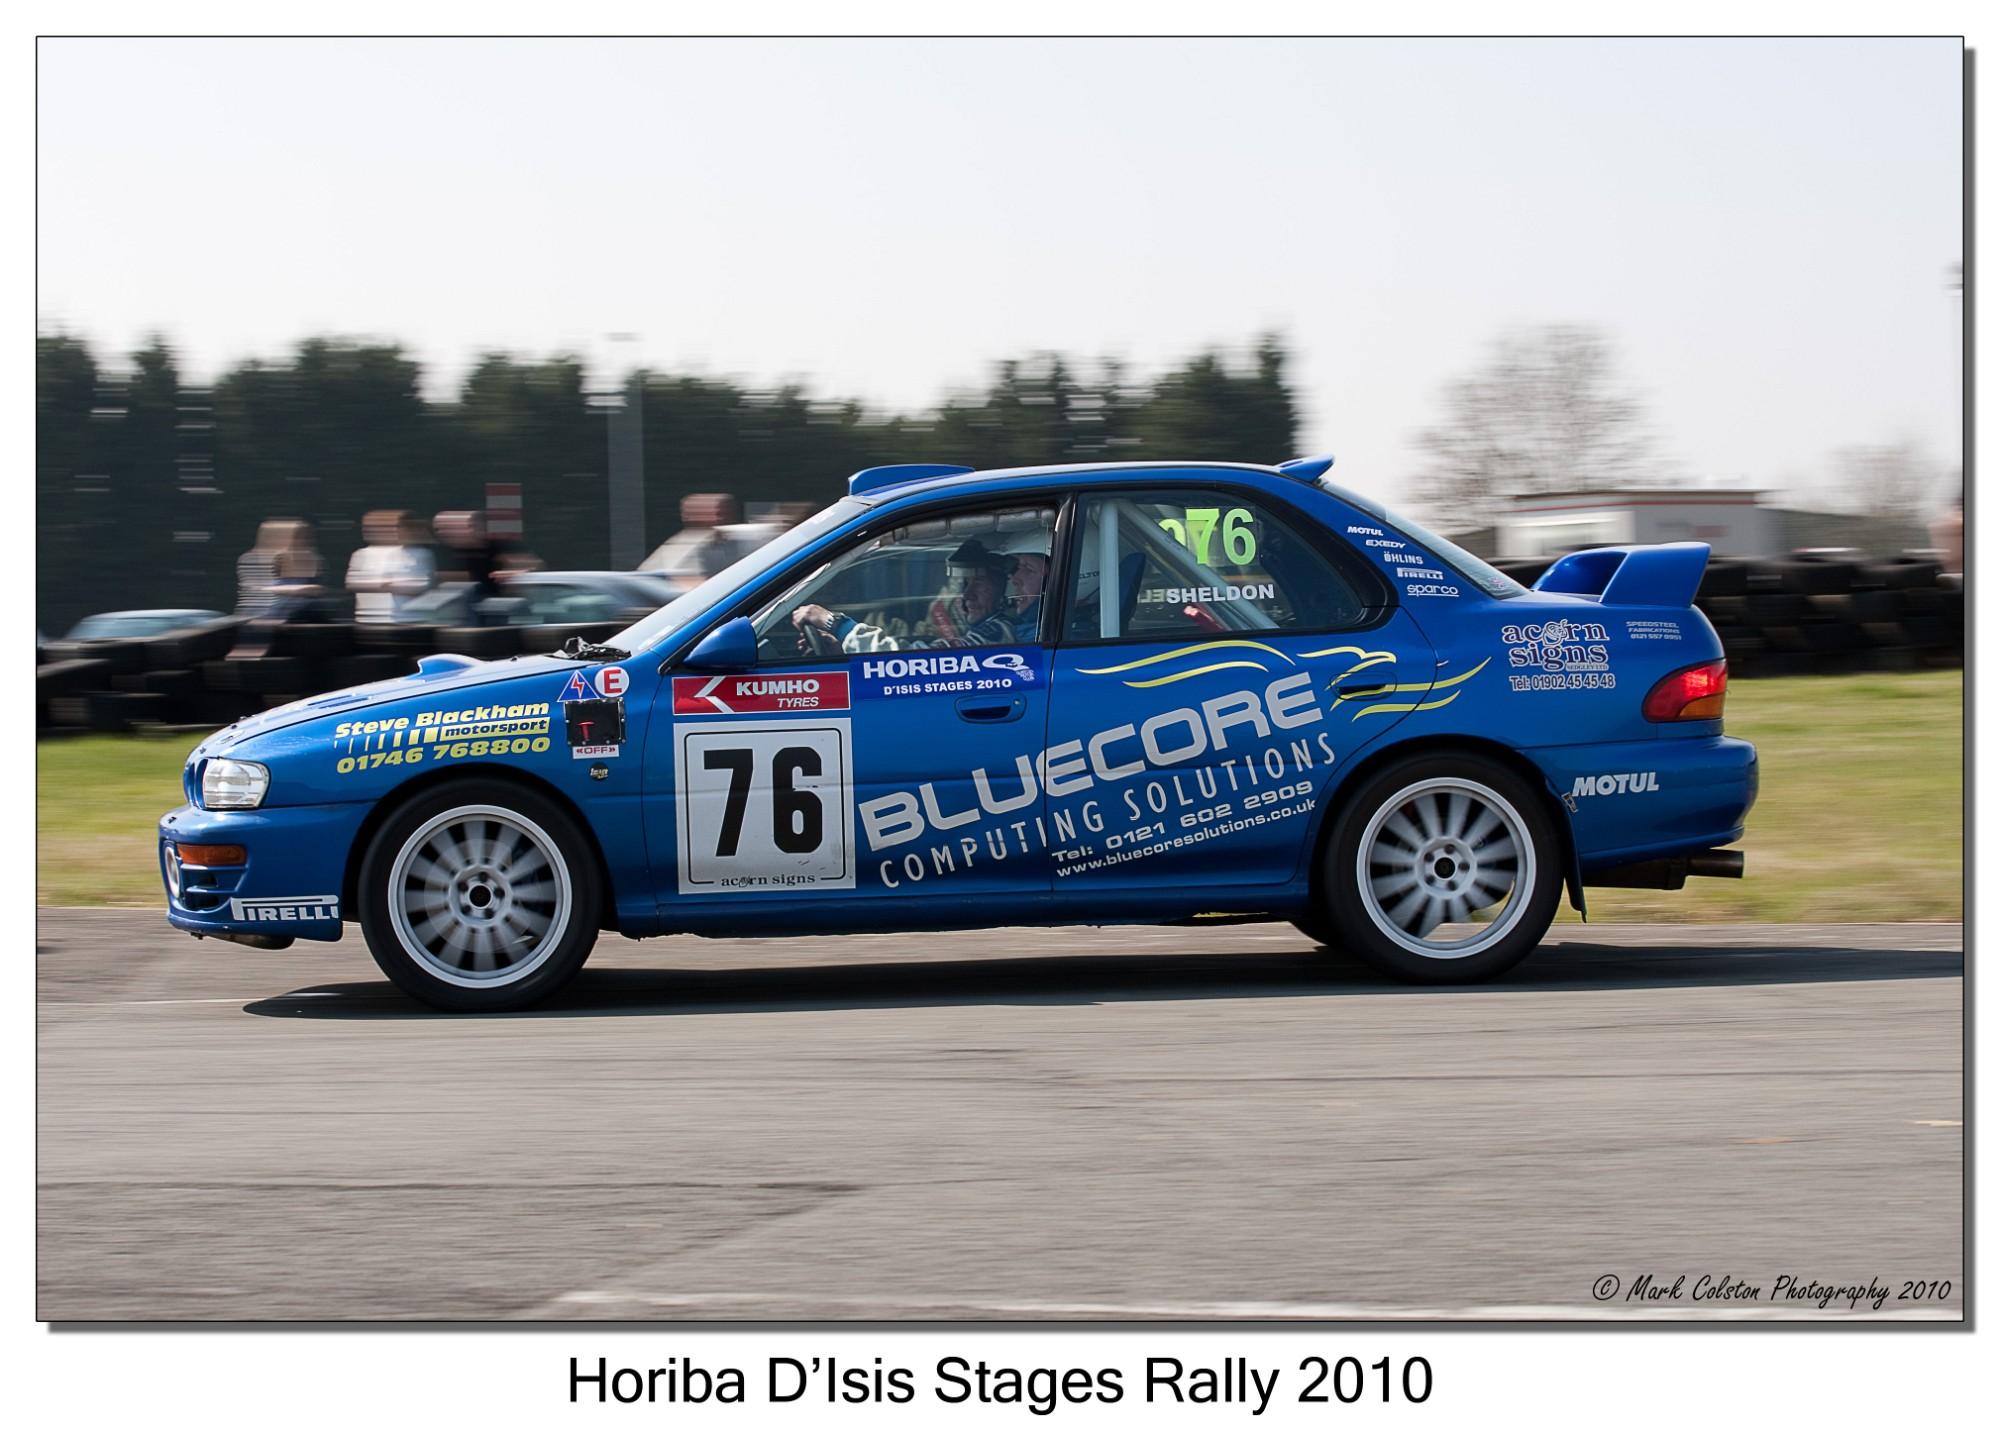 IMAGE: http://www.mark.colston-online.co.uk/Motorsport/D'Isis%202010/slides/IMG_2355%20EOS-1D%20Mark%20III%20copy.jpg